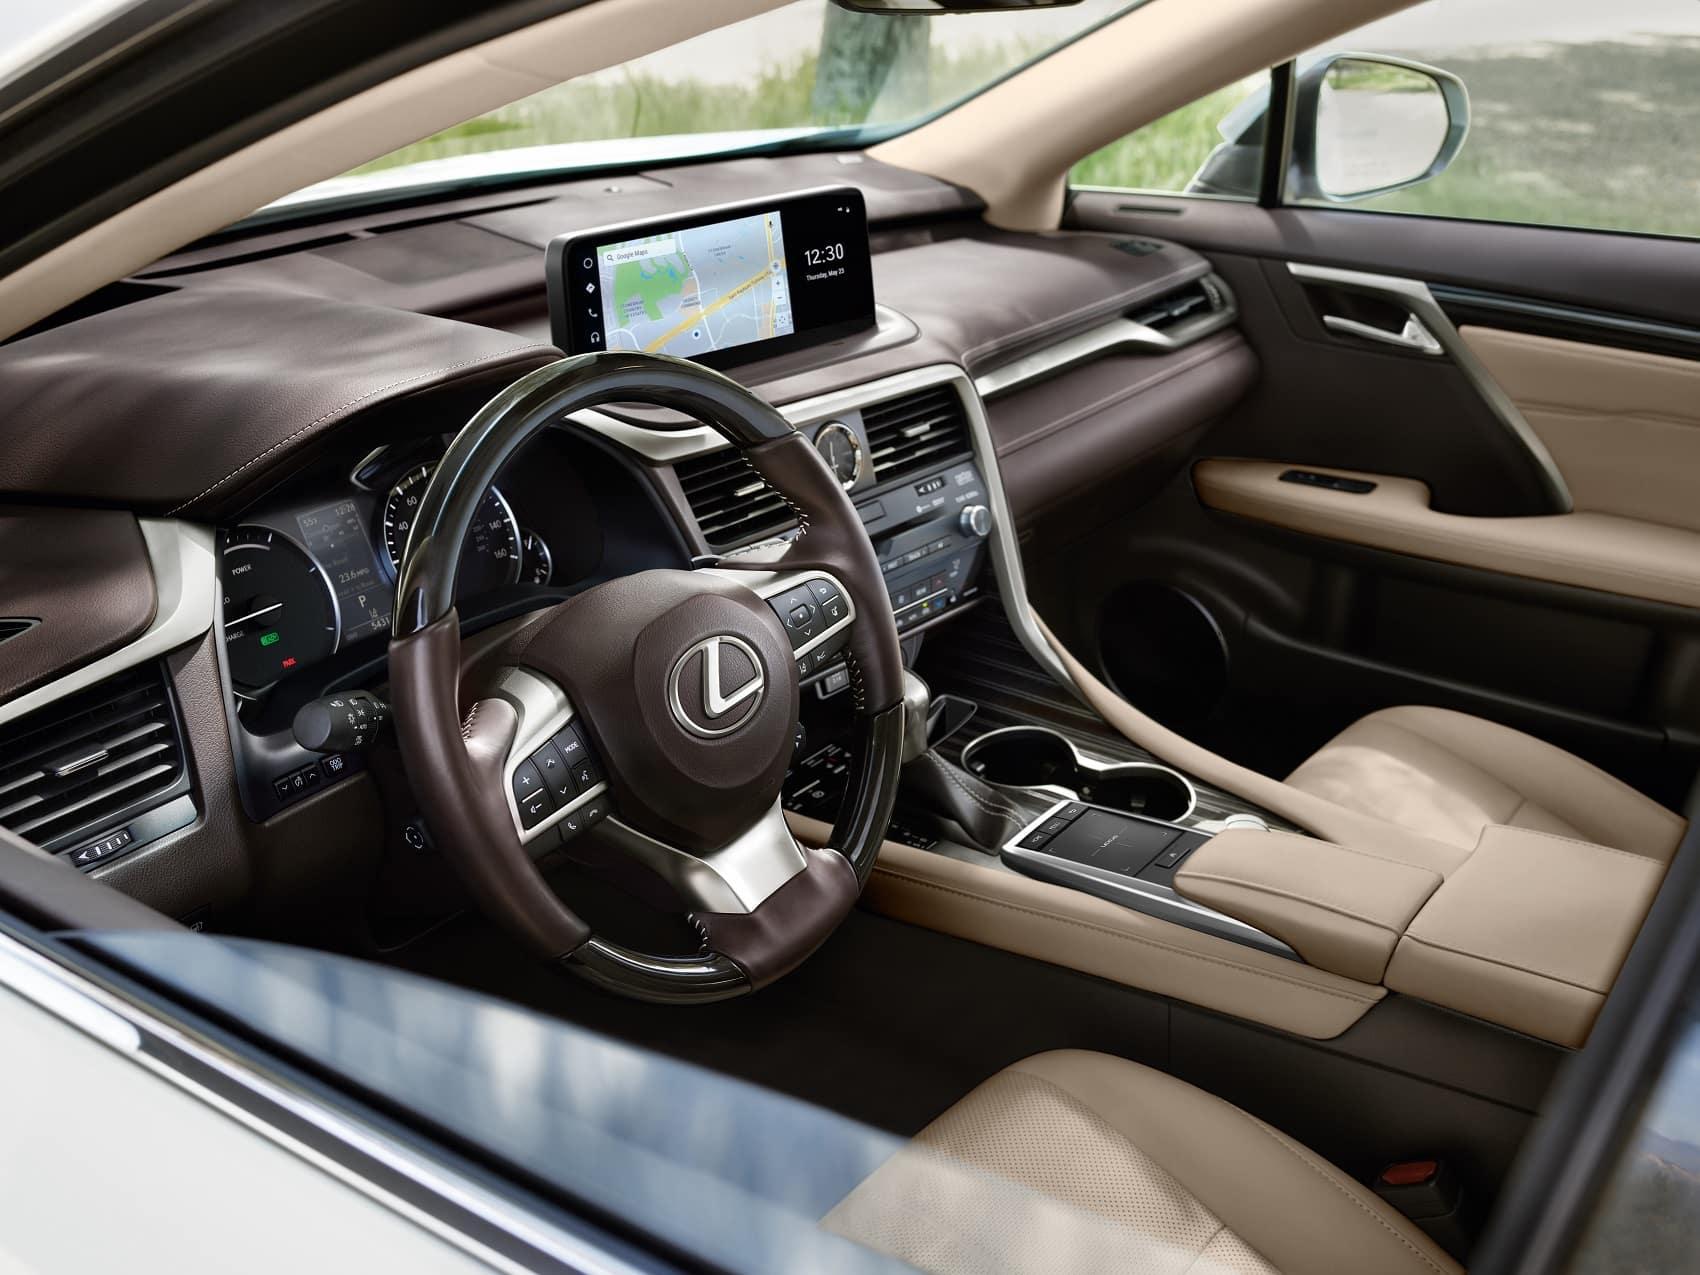 2021 Lexus UX Hybrid cabin infotainment system